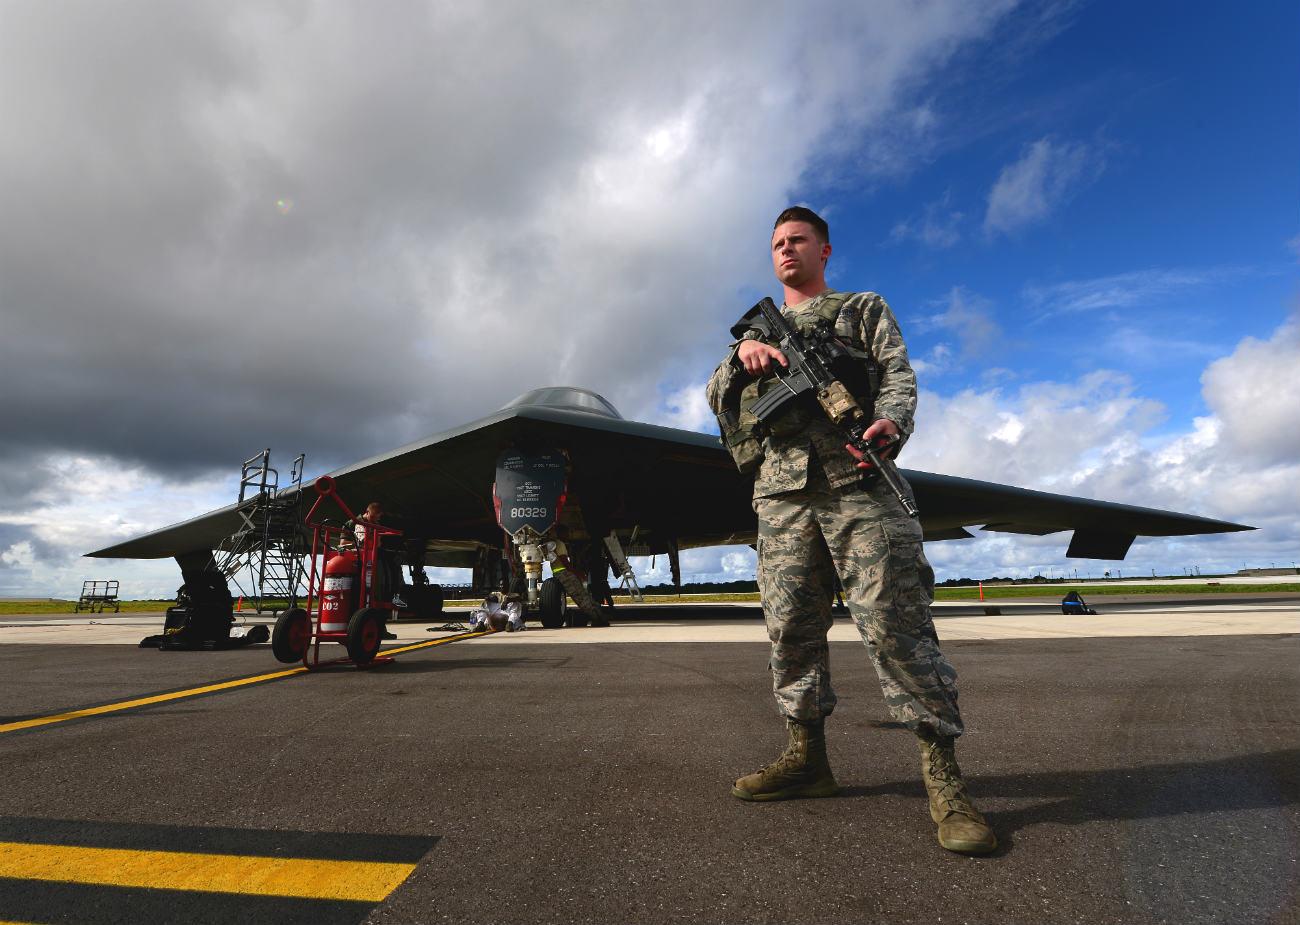 B-2 Spirit Aircraft Guarded